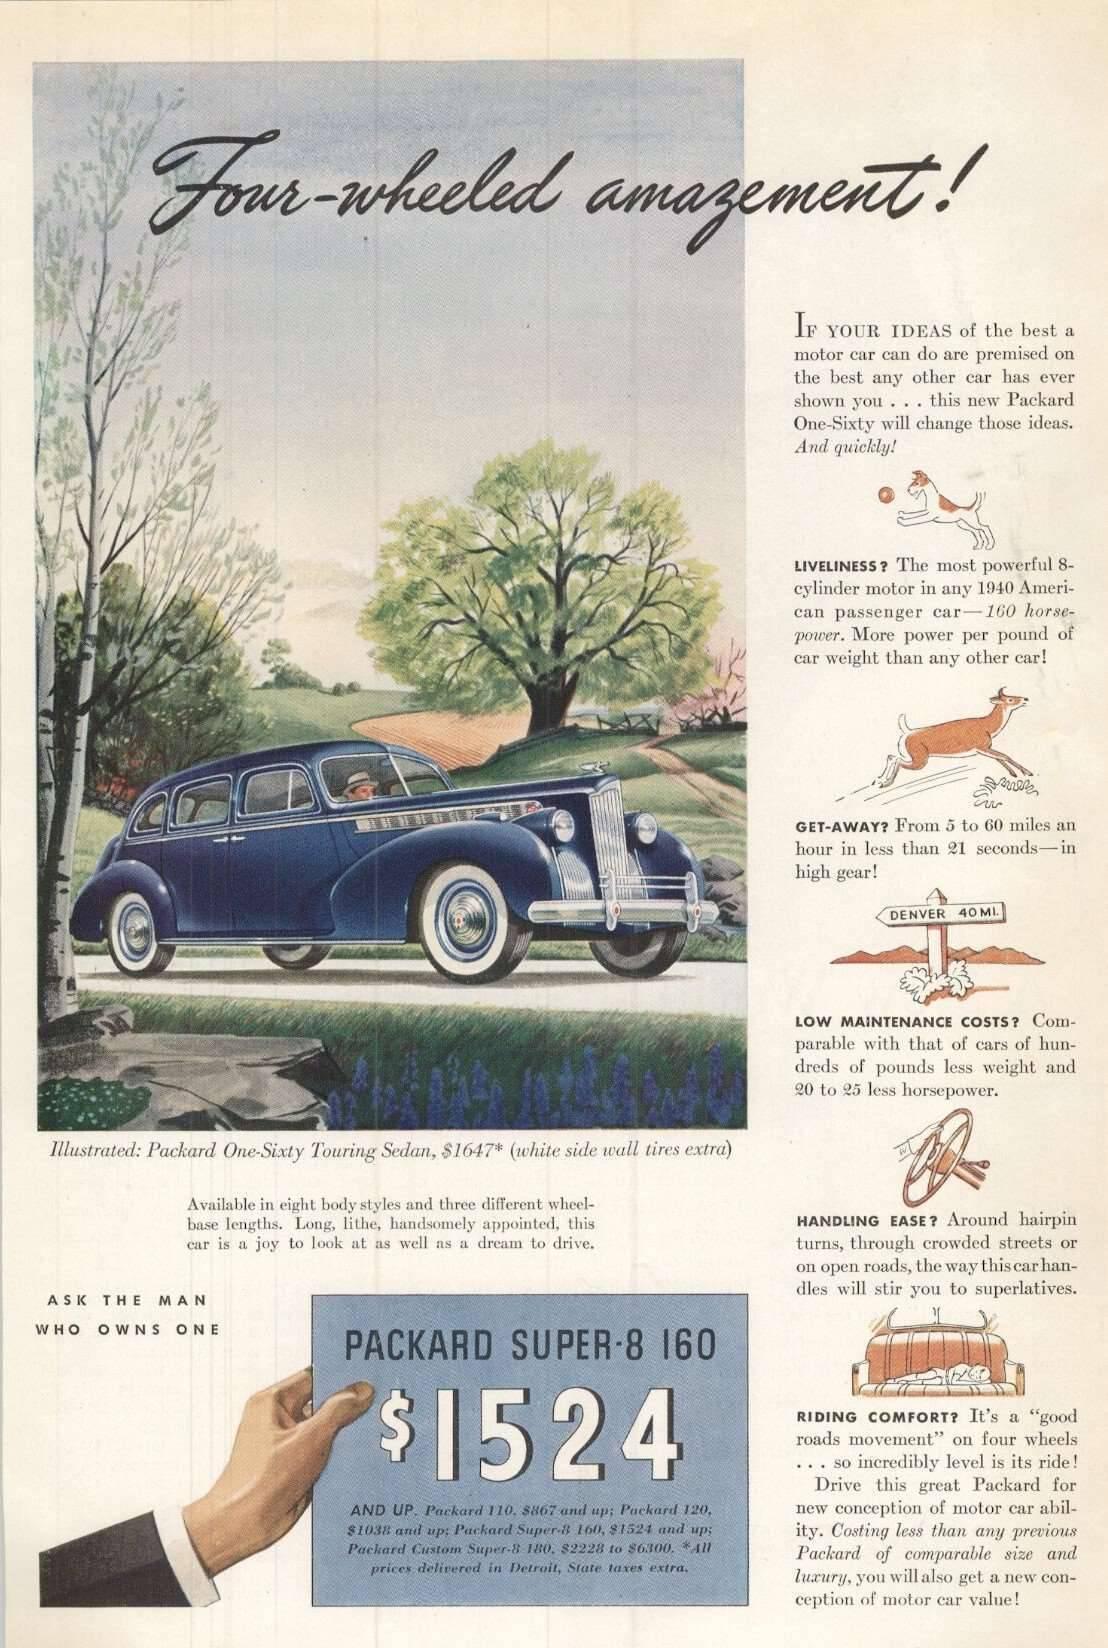 1940 One Sixty Touring Sedan